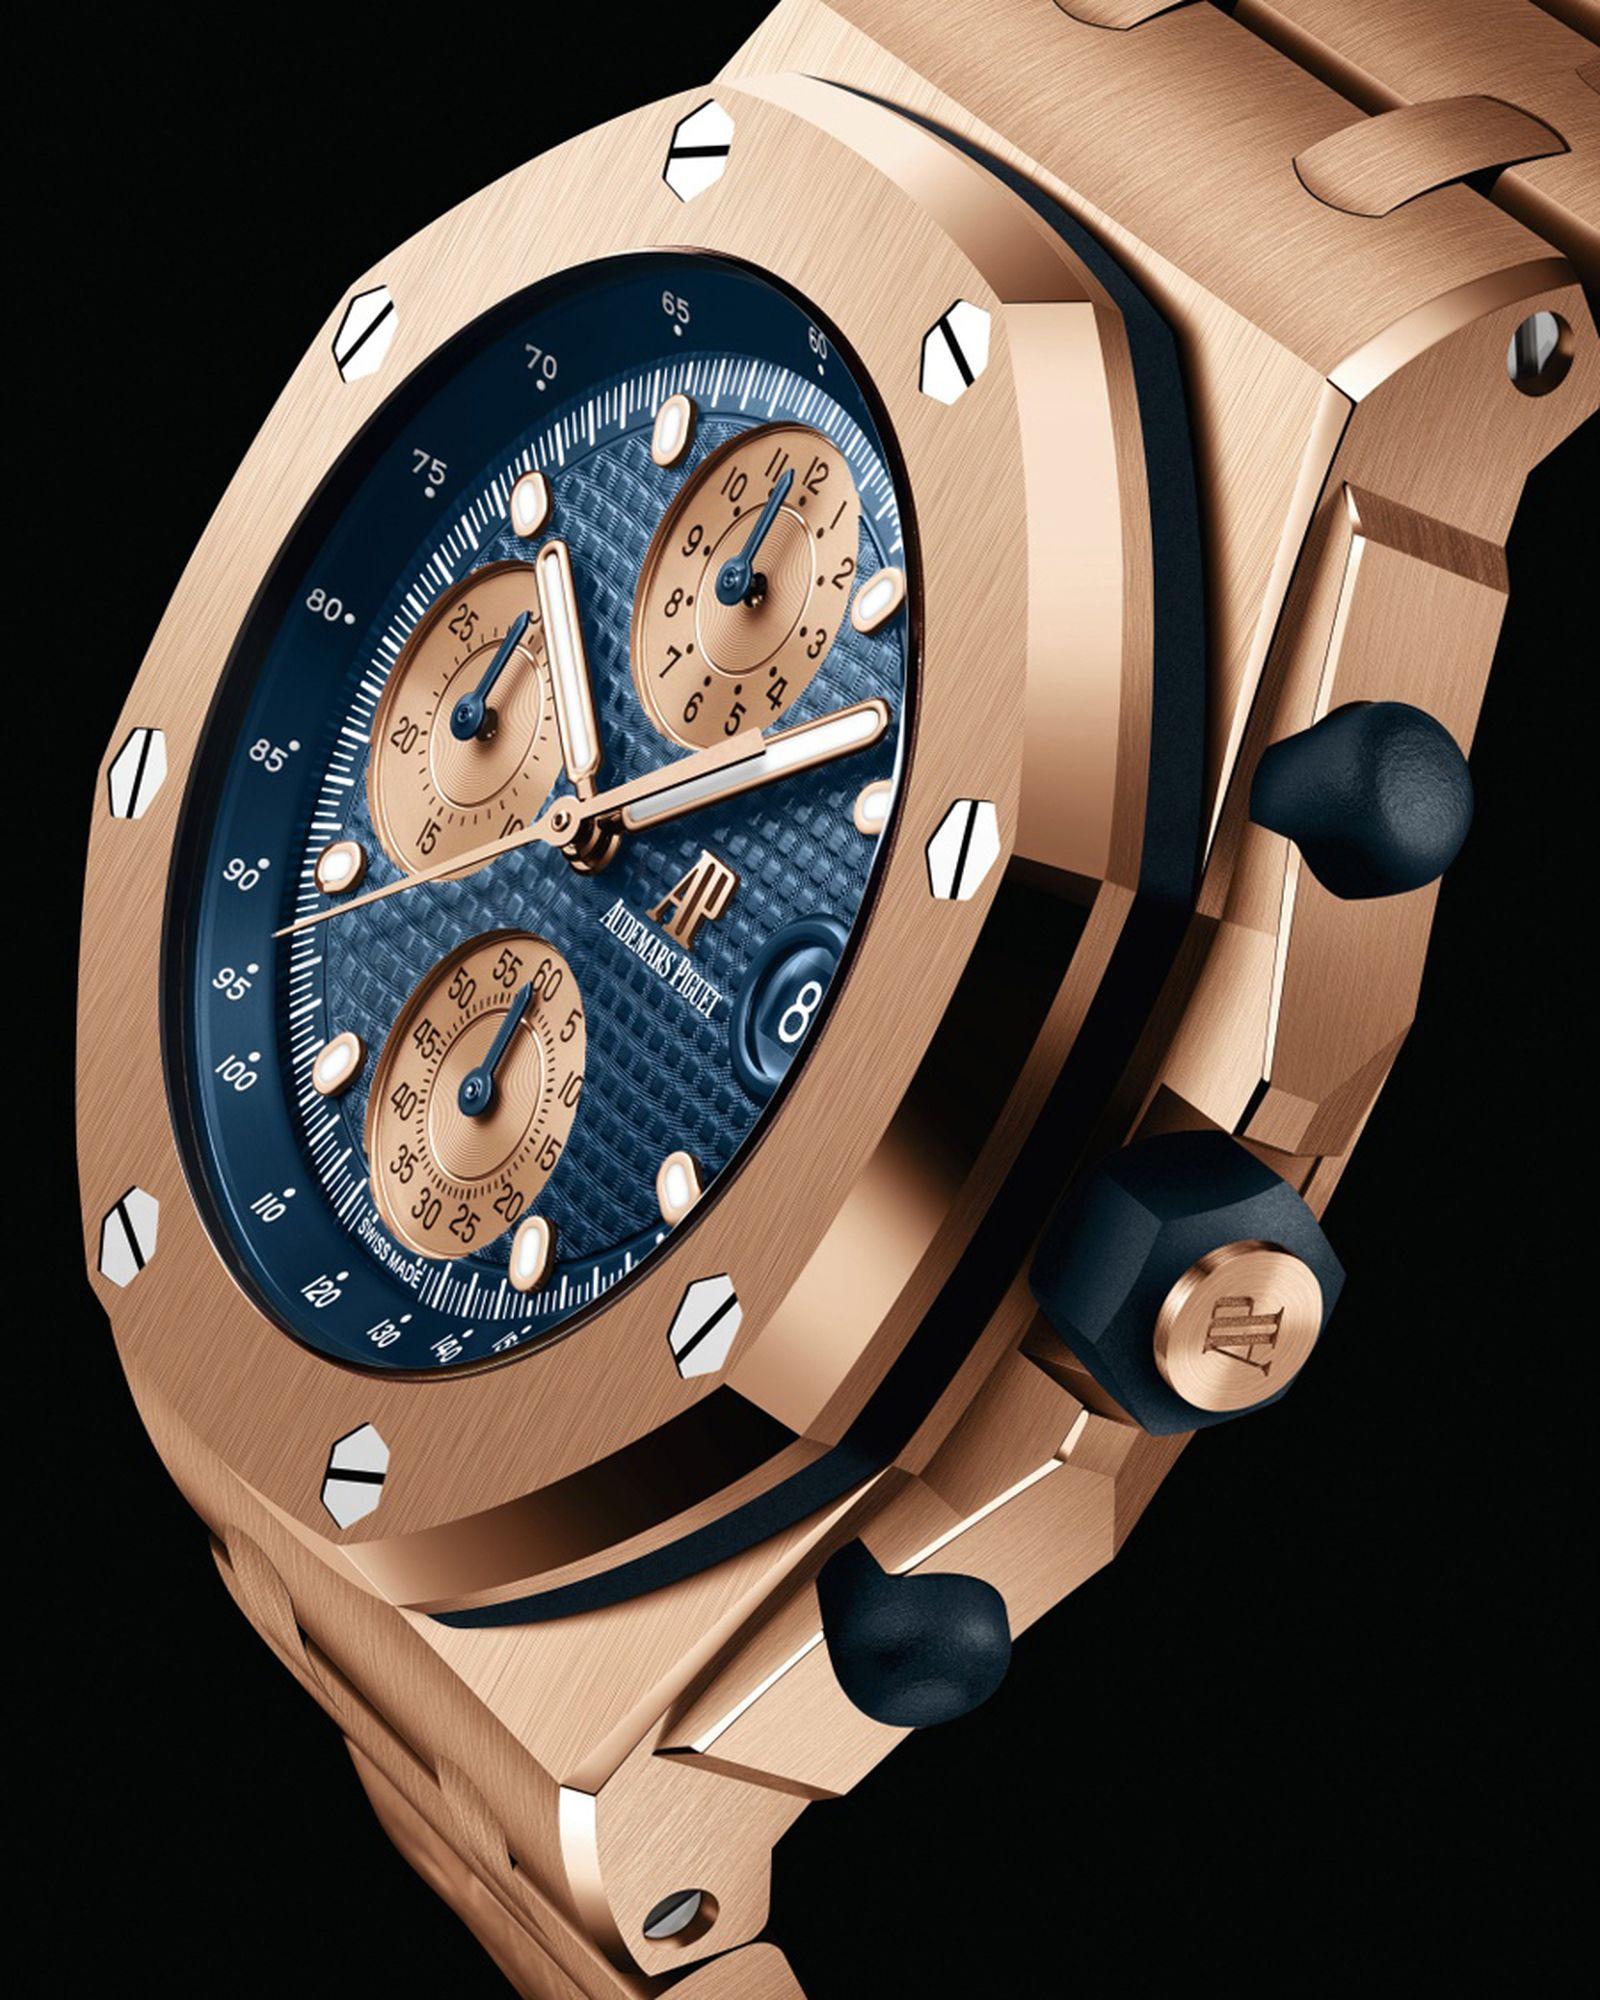 audemars-piguet-royal-oak-offshore-silver-gold- (1)